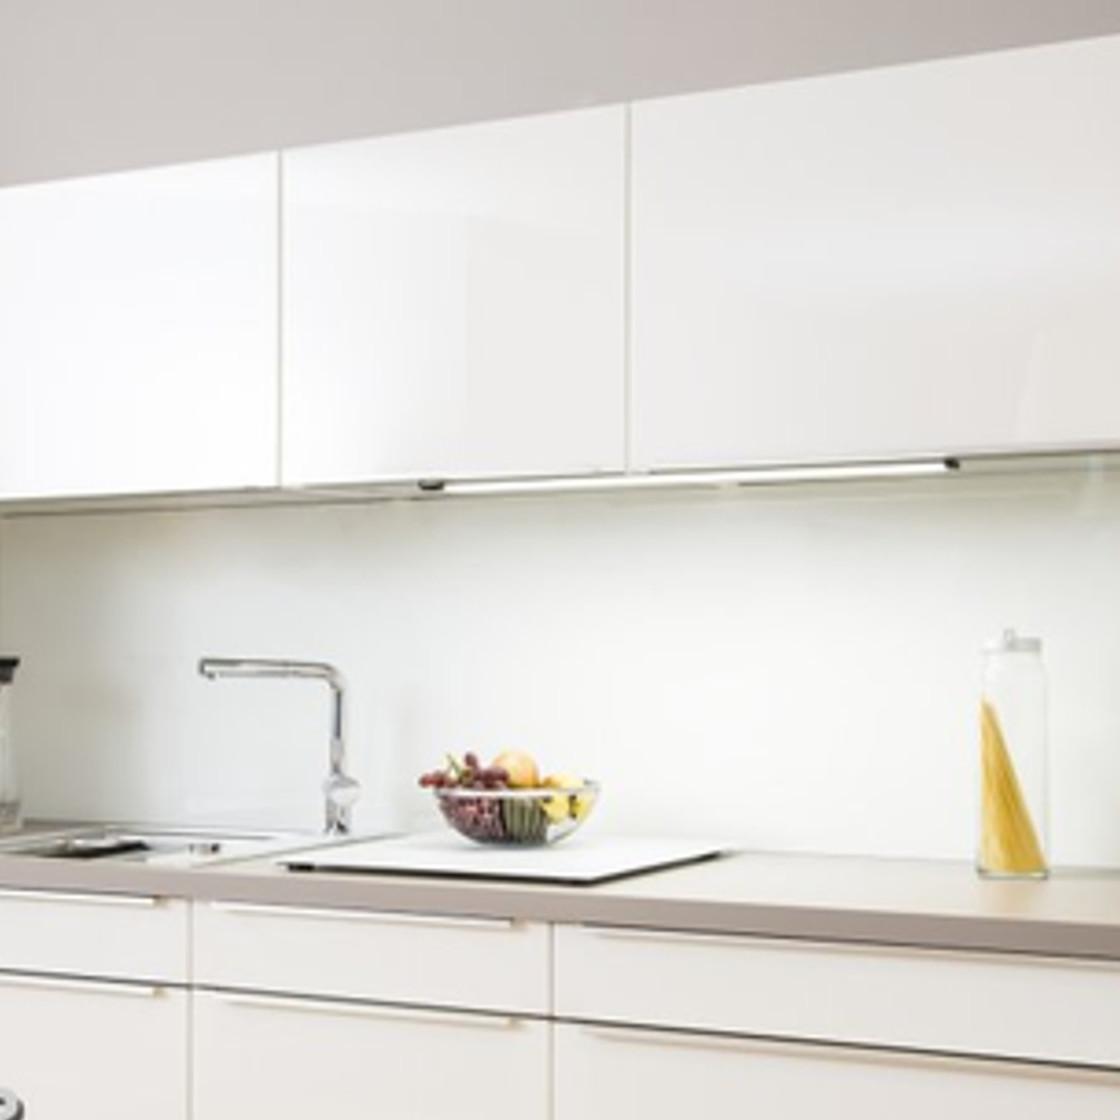 m ller licht 400098 led lichtleiste unterbau cabinet light flat. Black Bedroom Furniture Sets. Home Design Ideas